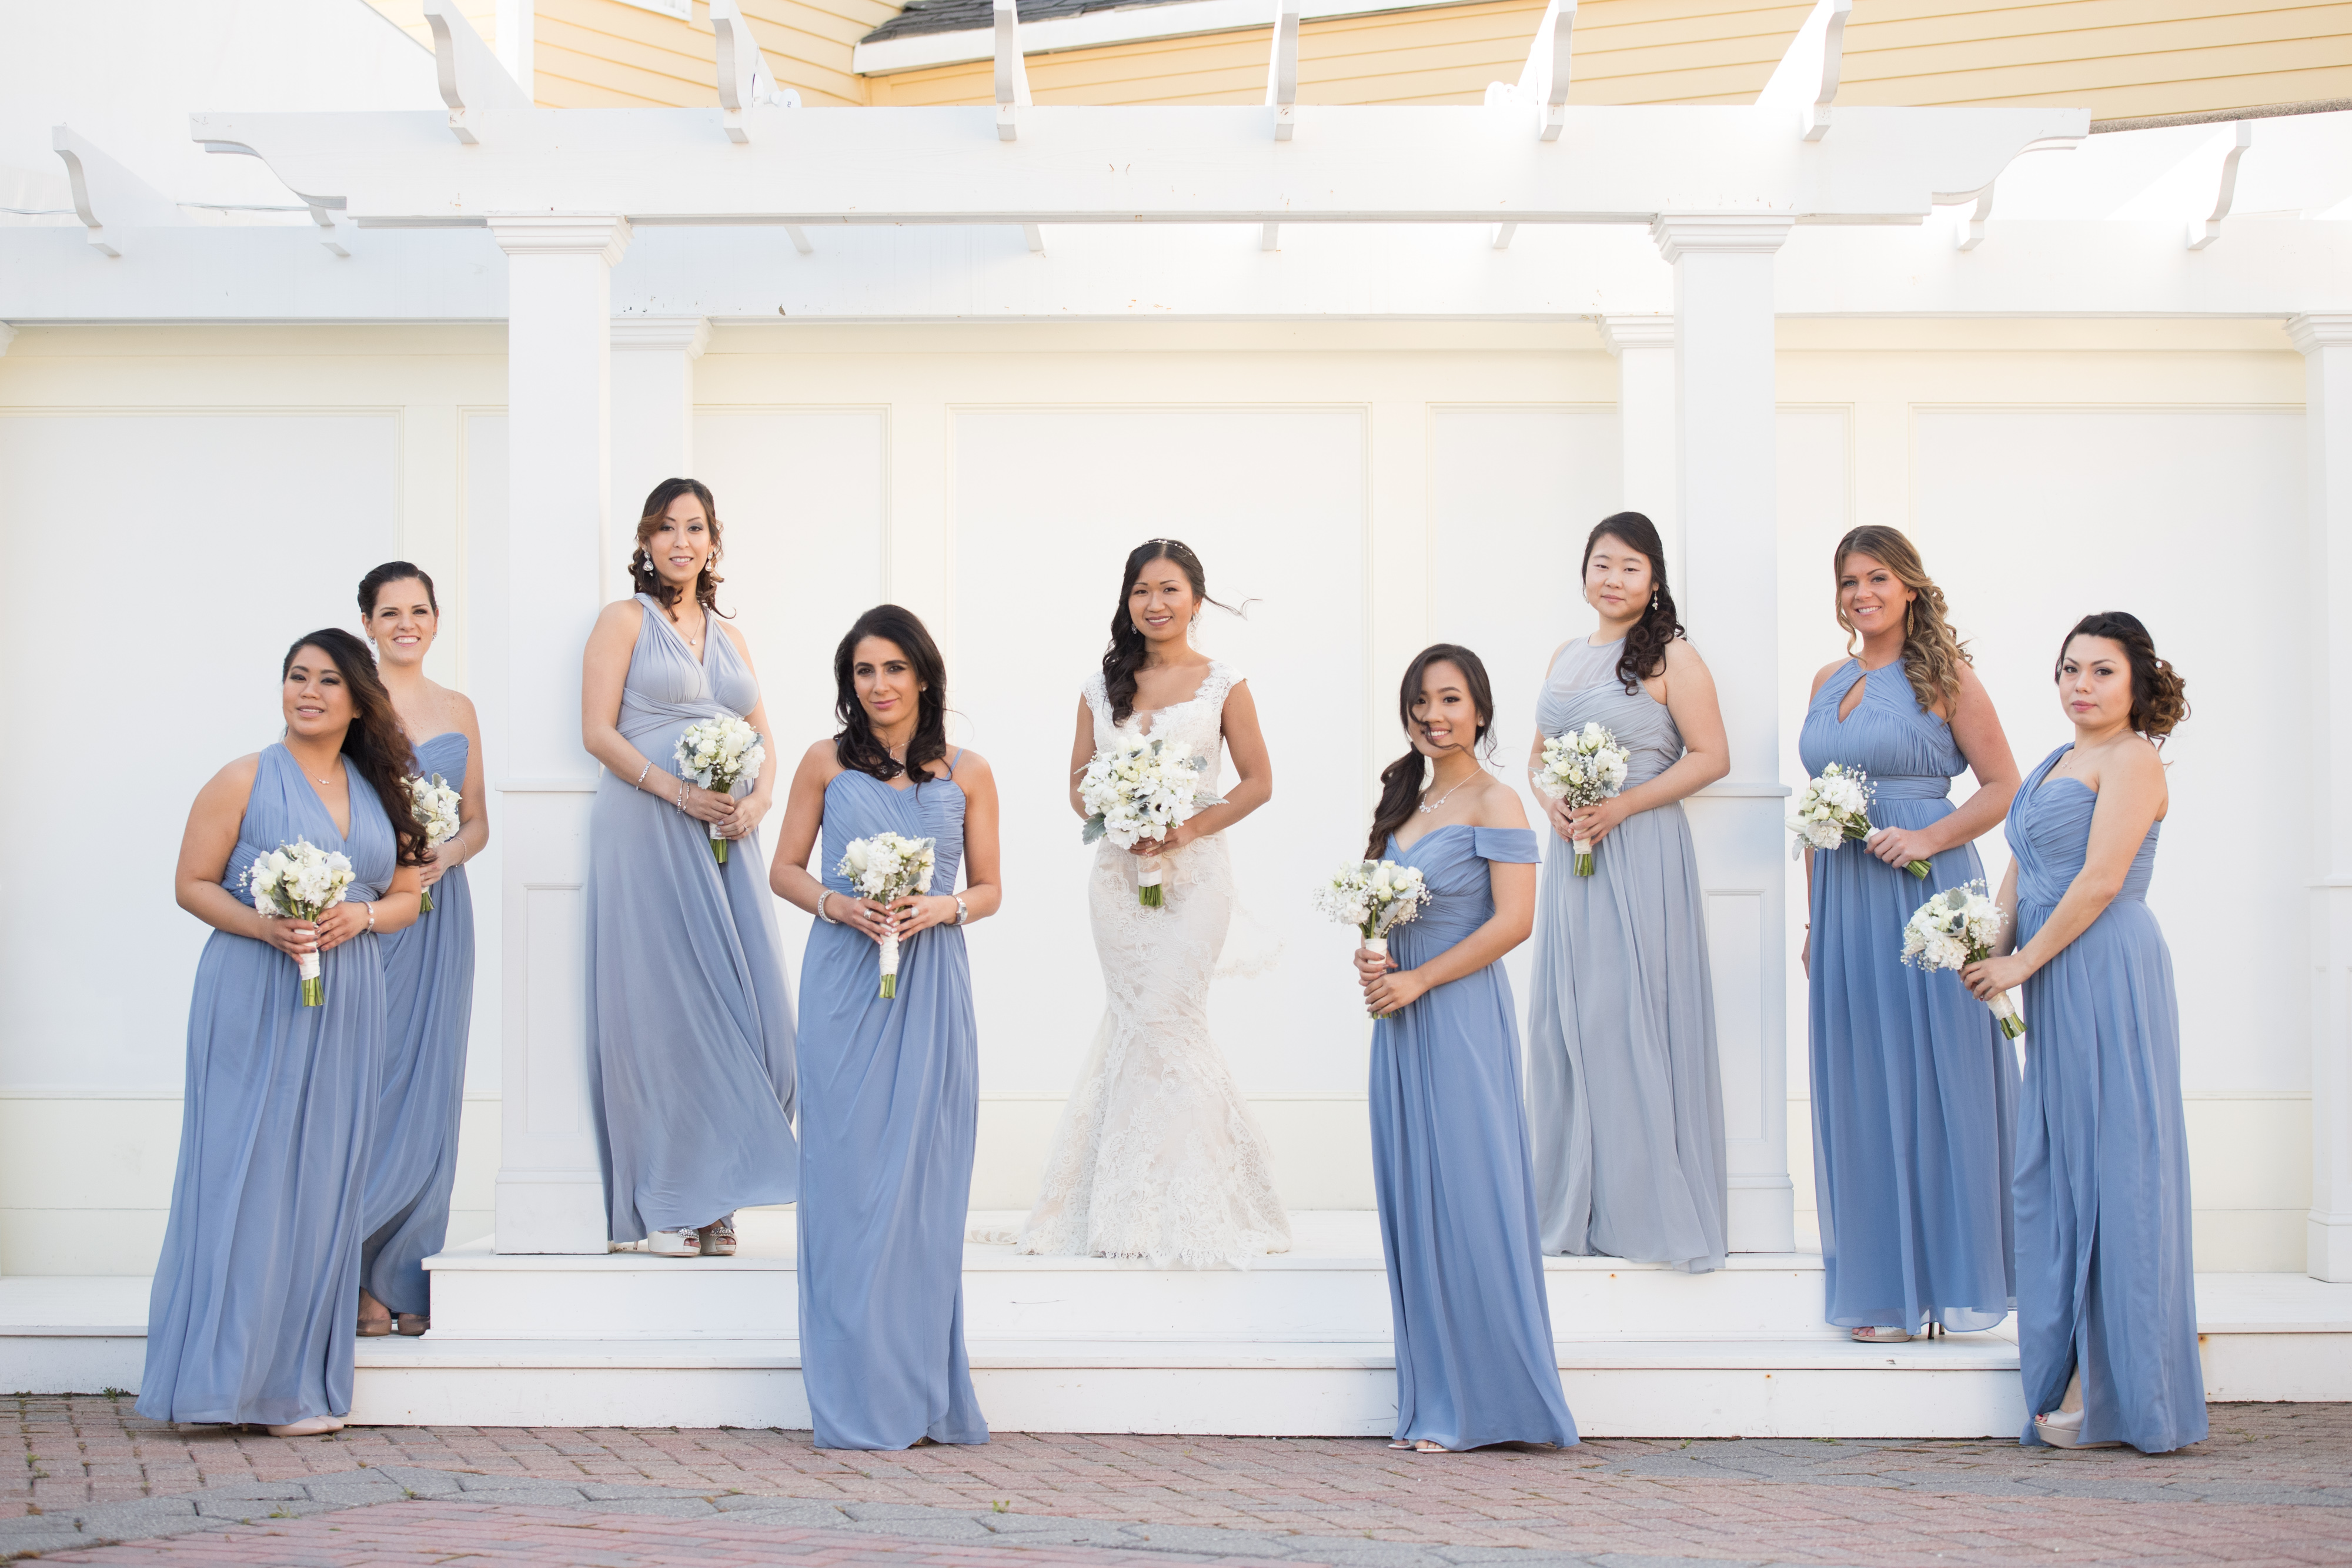 JP Wedding Photos By Lotus Weddings 0481